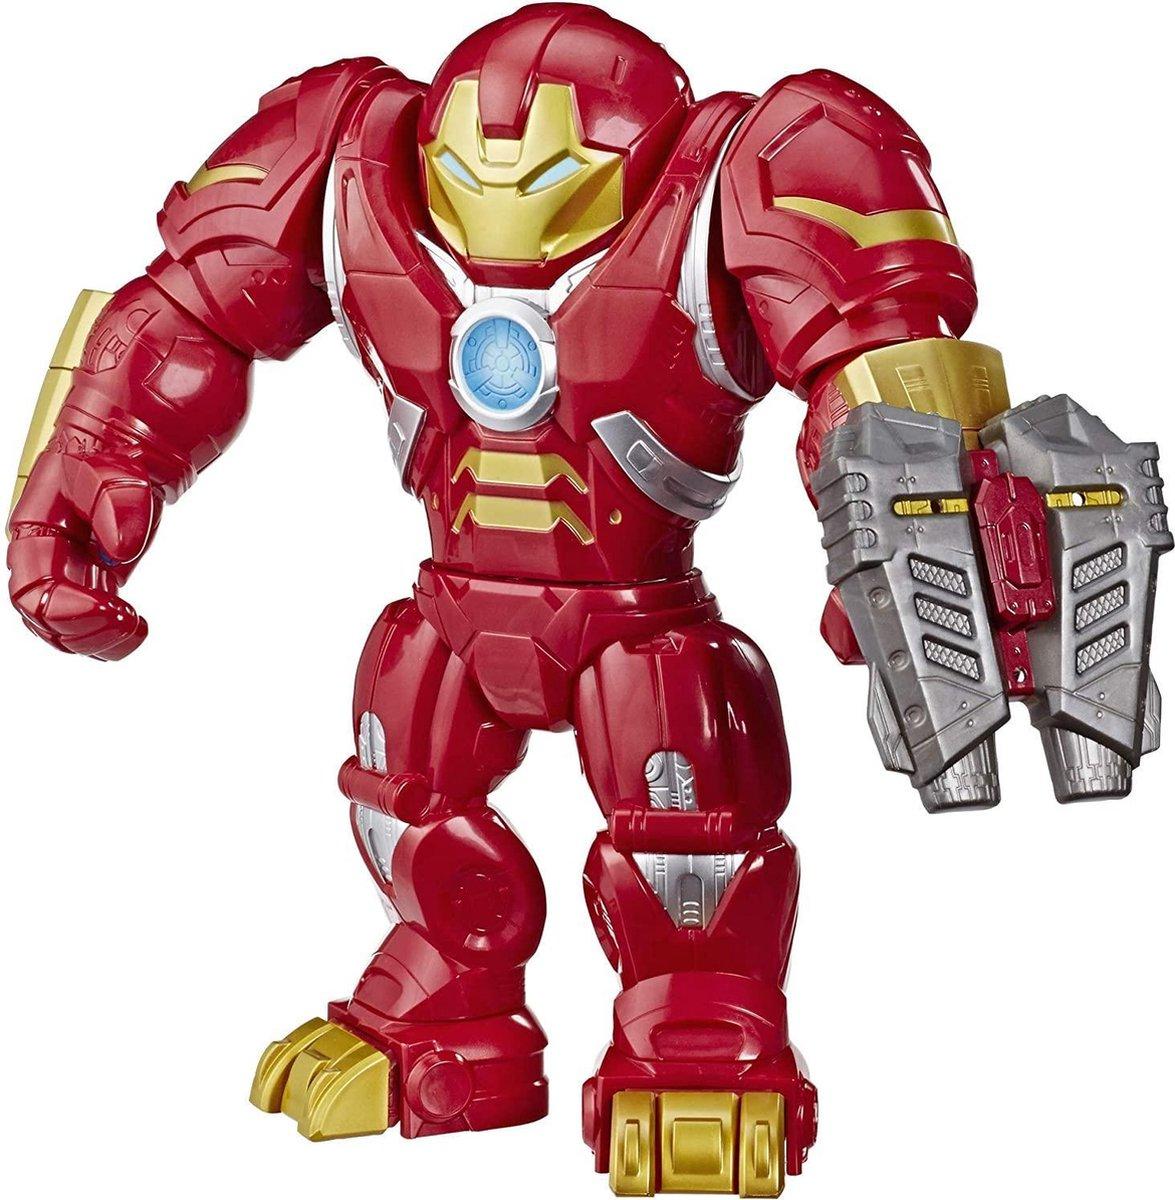 Marvel Super Hero Adventures - Mega Mighties - Iron Man Hulkbuster Armor - Speelfiguur